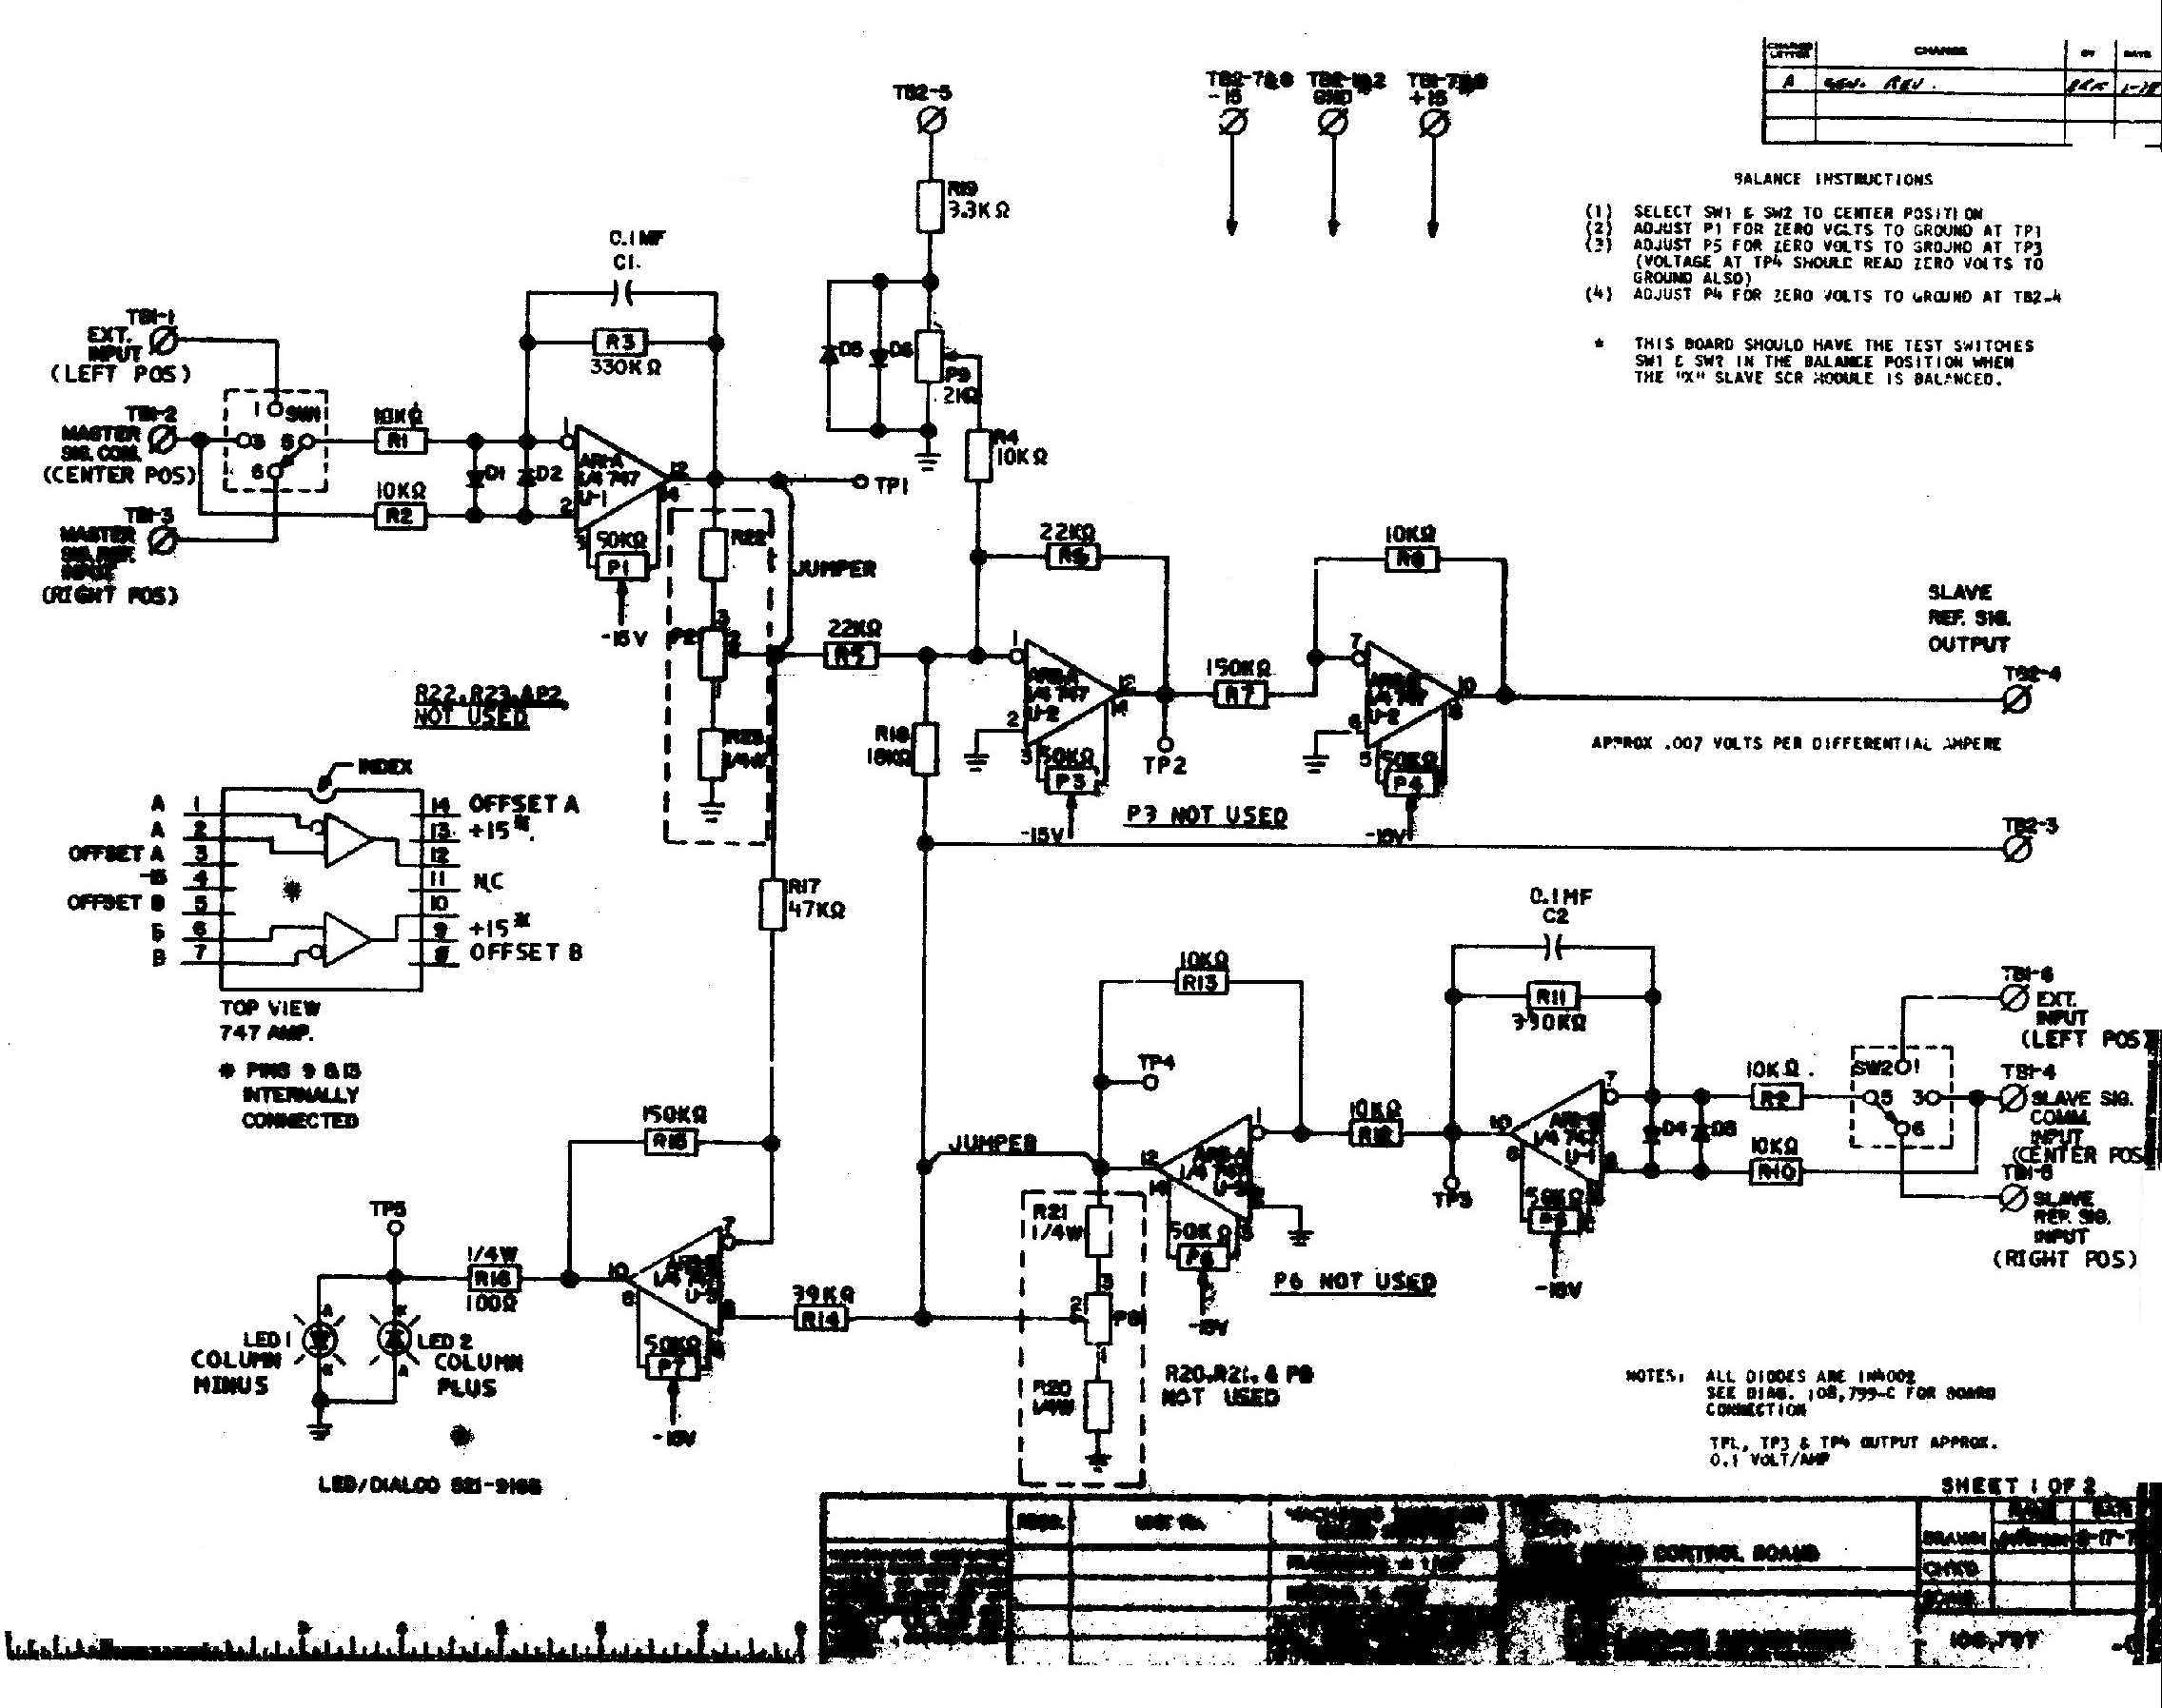 Terrific Liebherr Mobile Crane Ltm 10801 Diagrams Air Hidrauli Electric Wiring Cloud Hisonuggs Outletorg